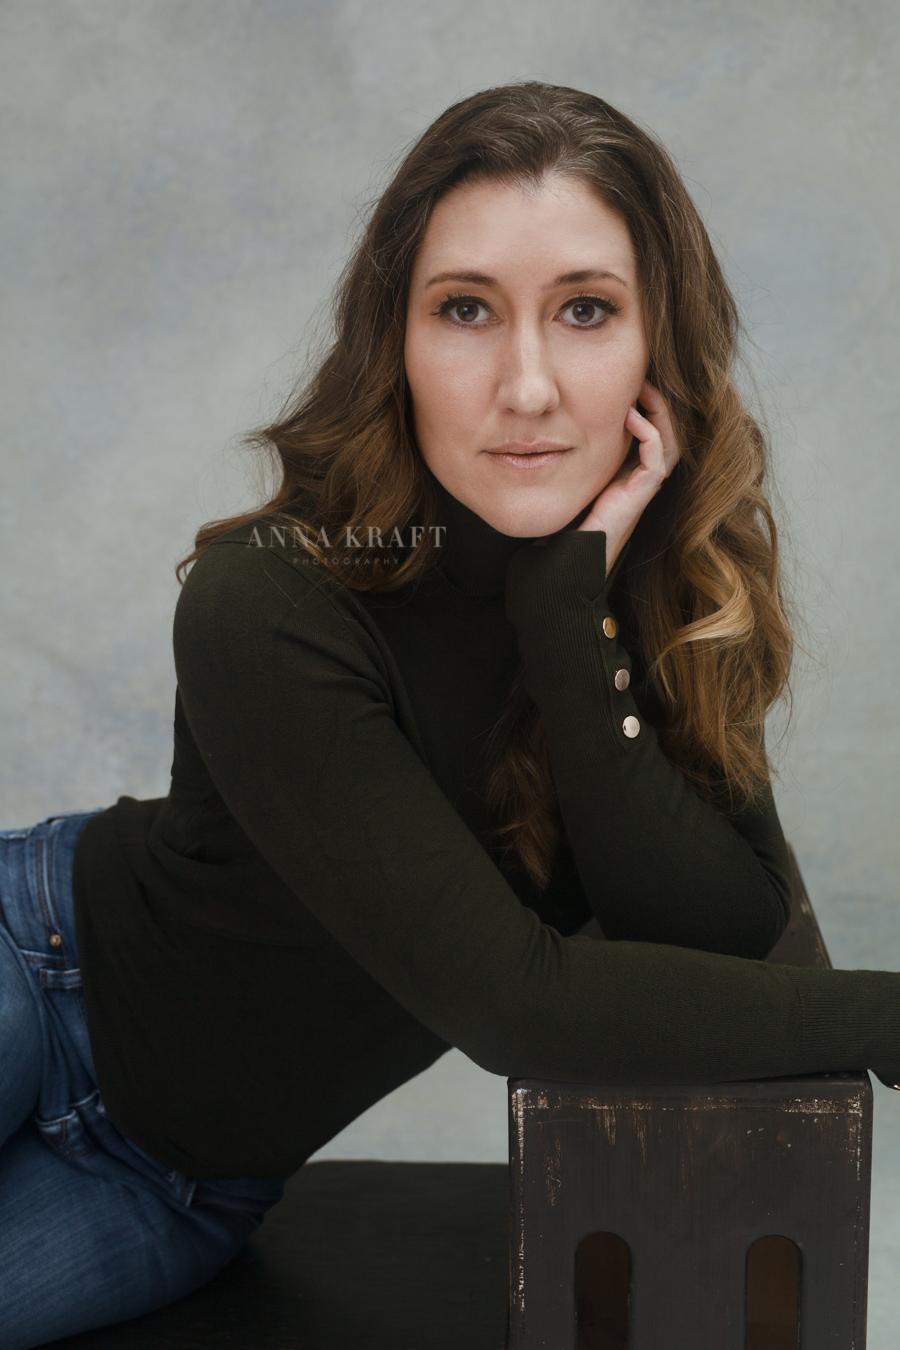 anna_kraft_photography_georgetown_square_studio_motherhood_beauty_portrait-4.jpg